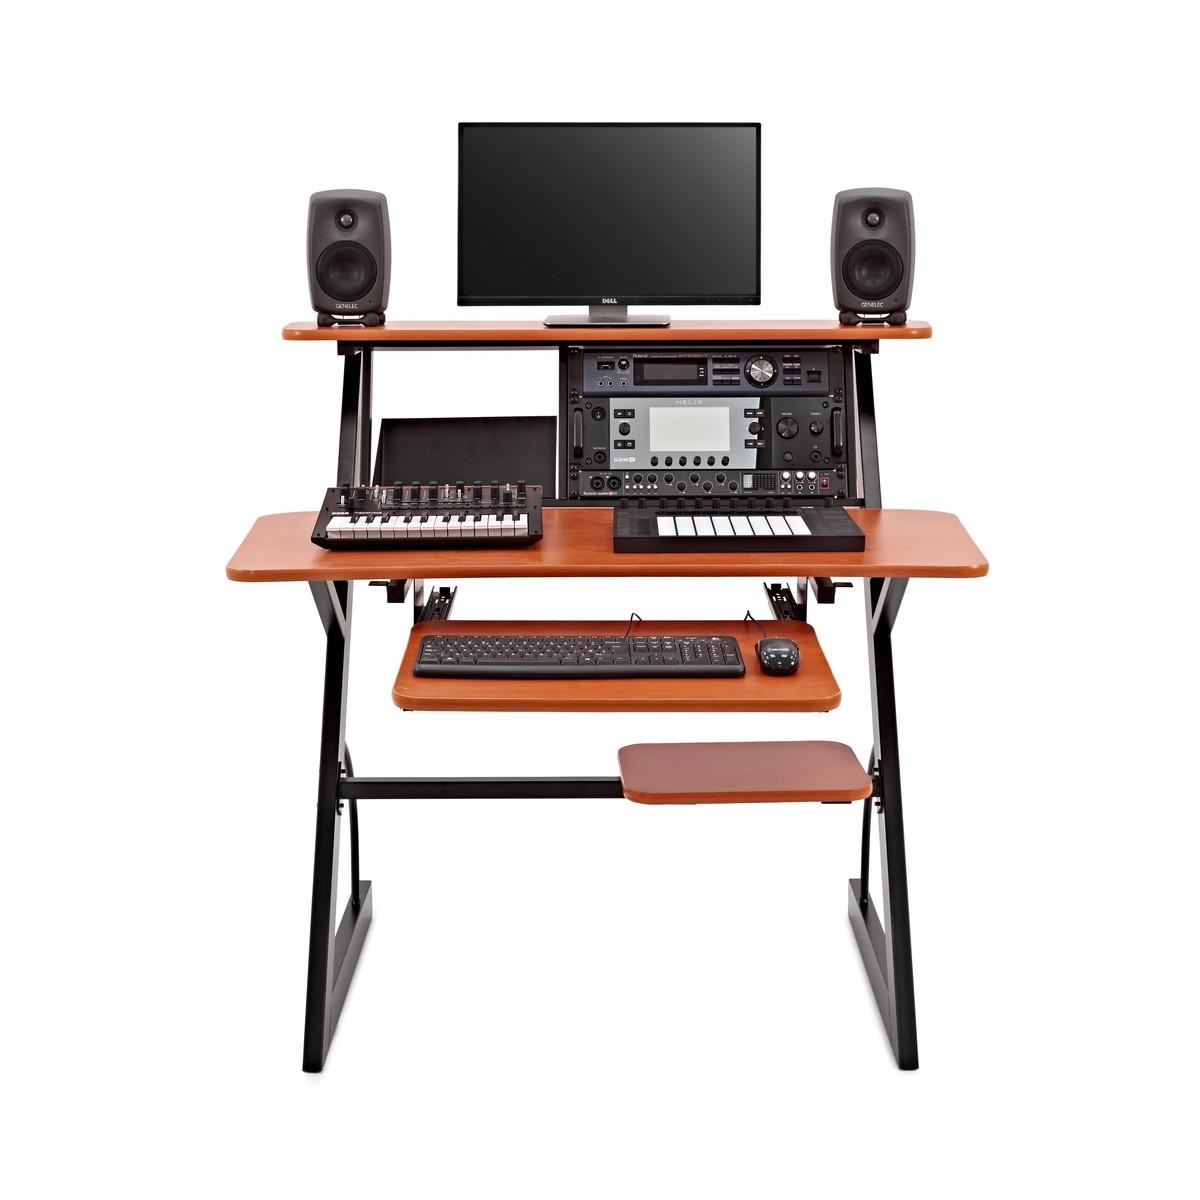 Favoloso 4 Tier Home Studio Desk by Gear4music, 6U at Gear4music.com HN24